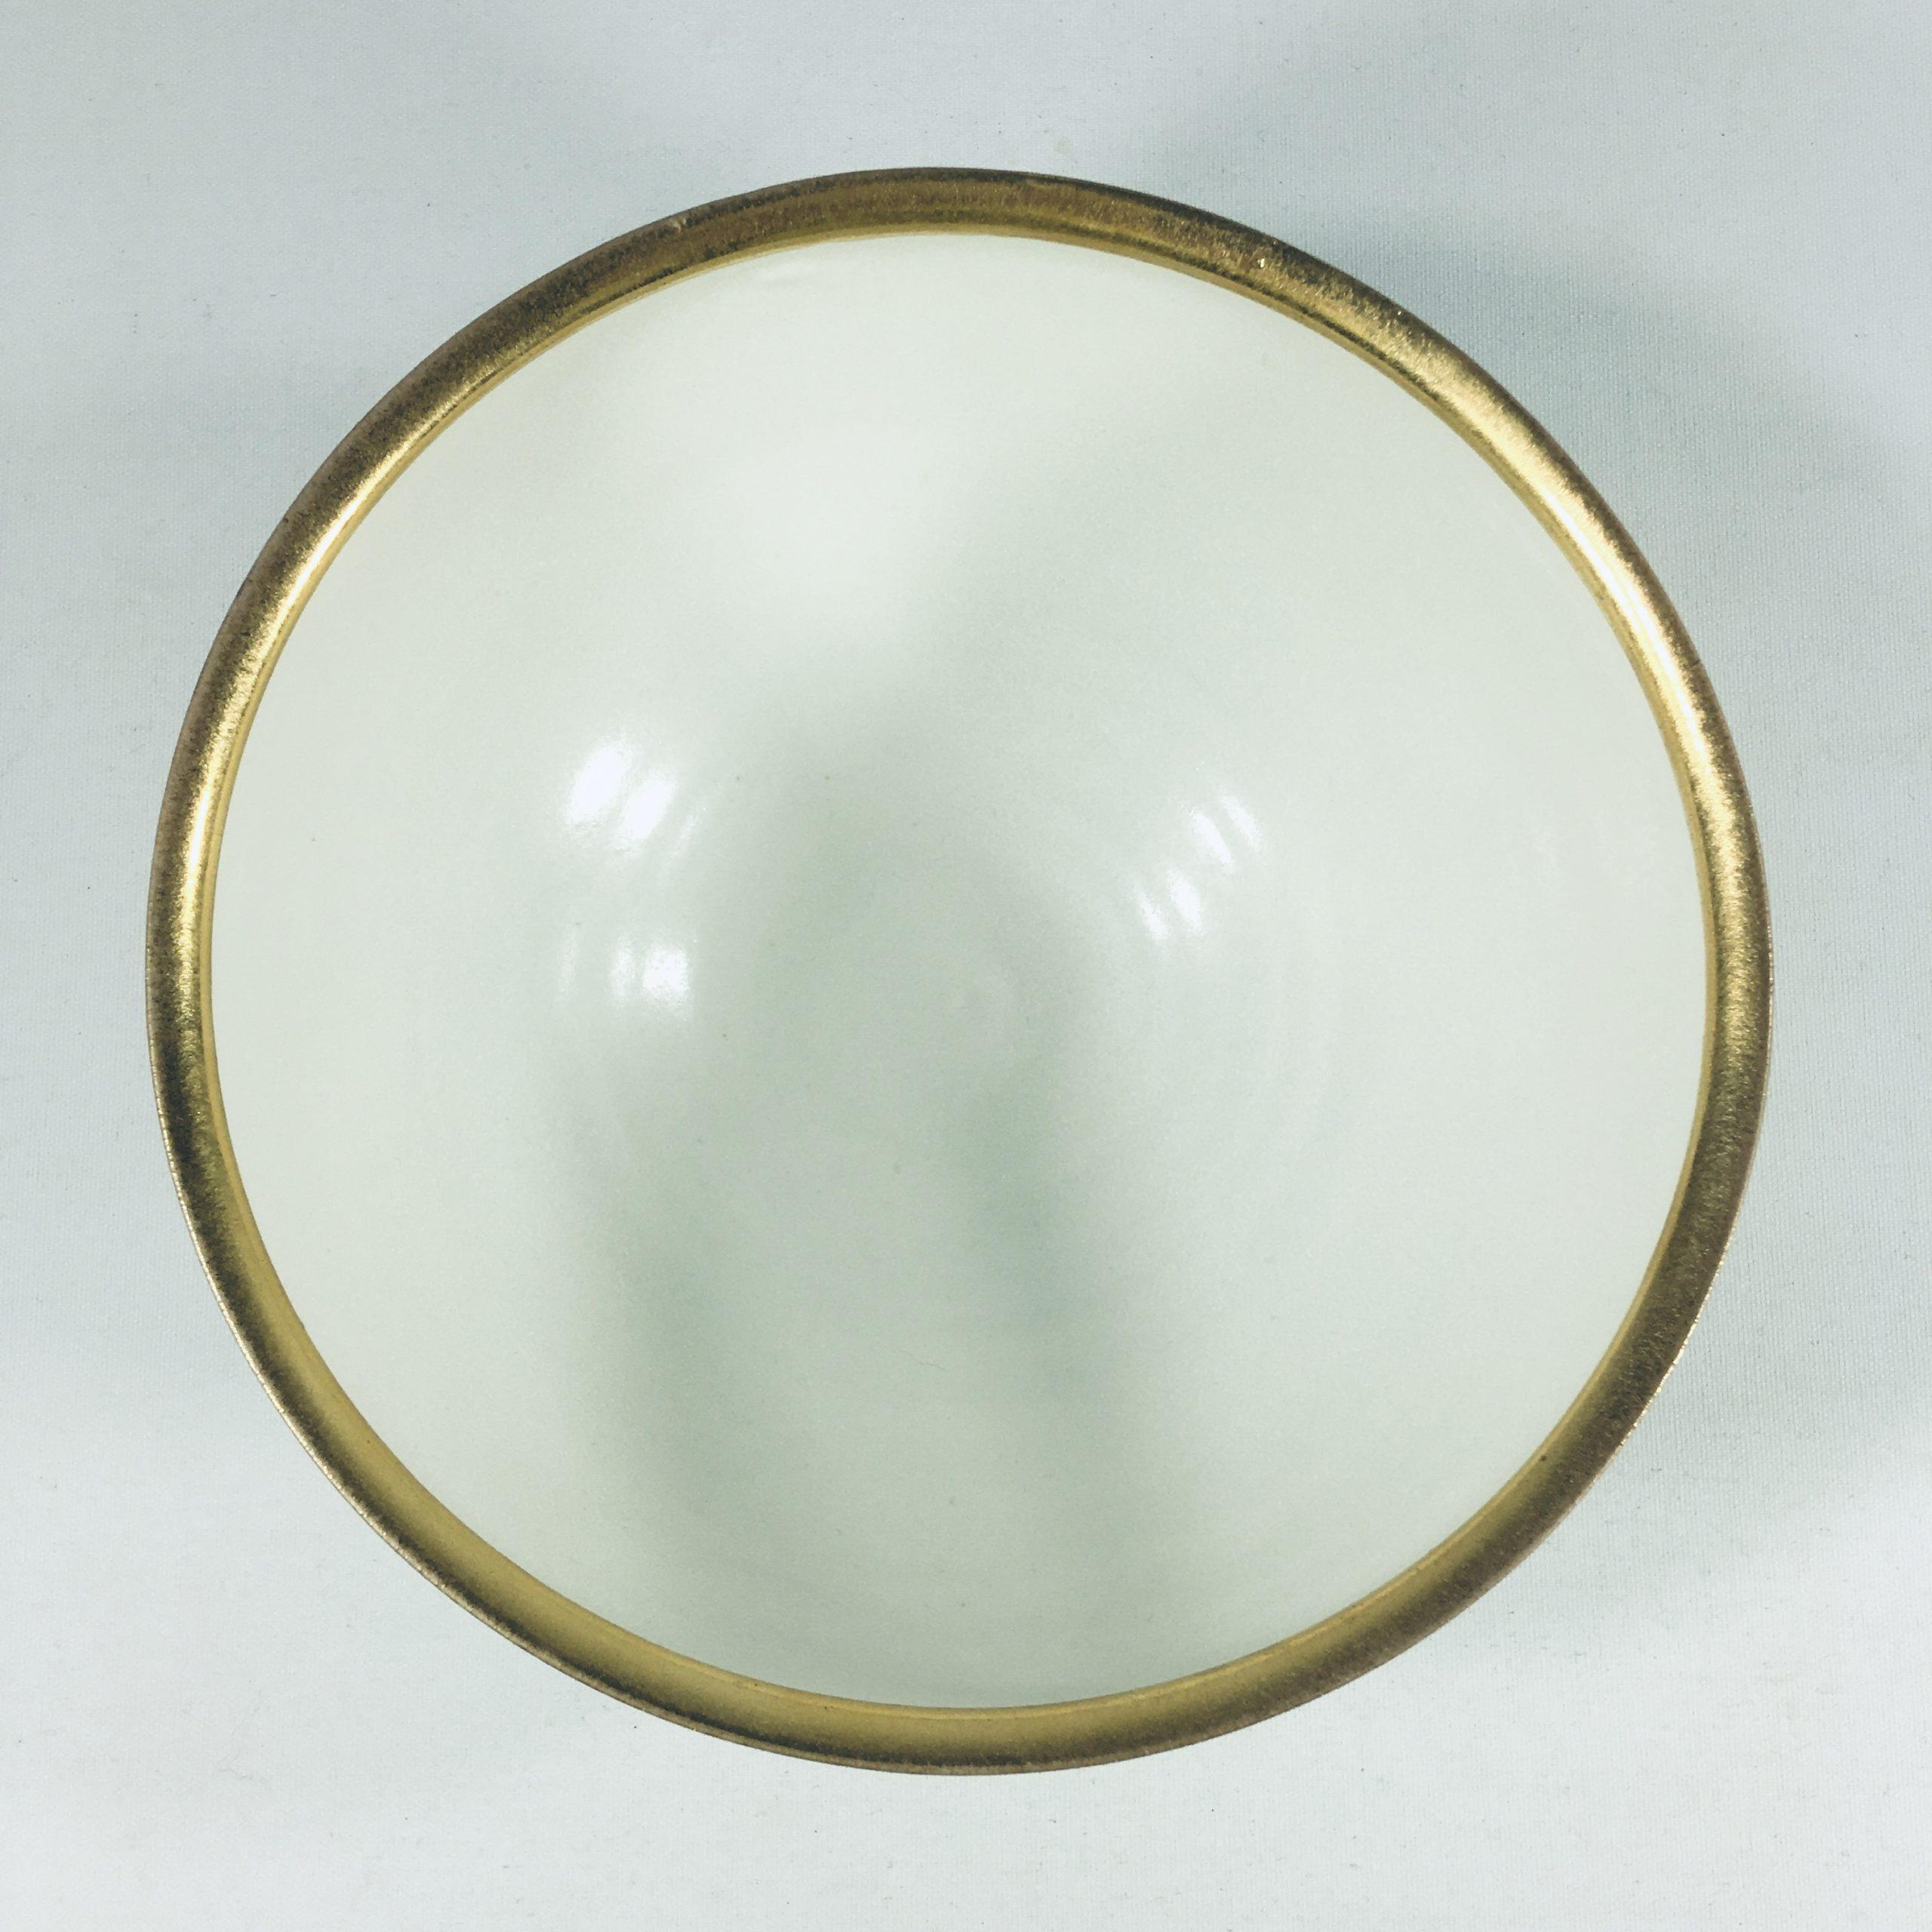 Porzellanschalen-Unikat mit feinem Goldrand Bild 2